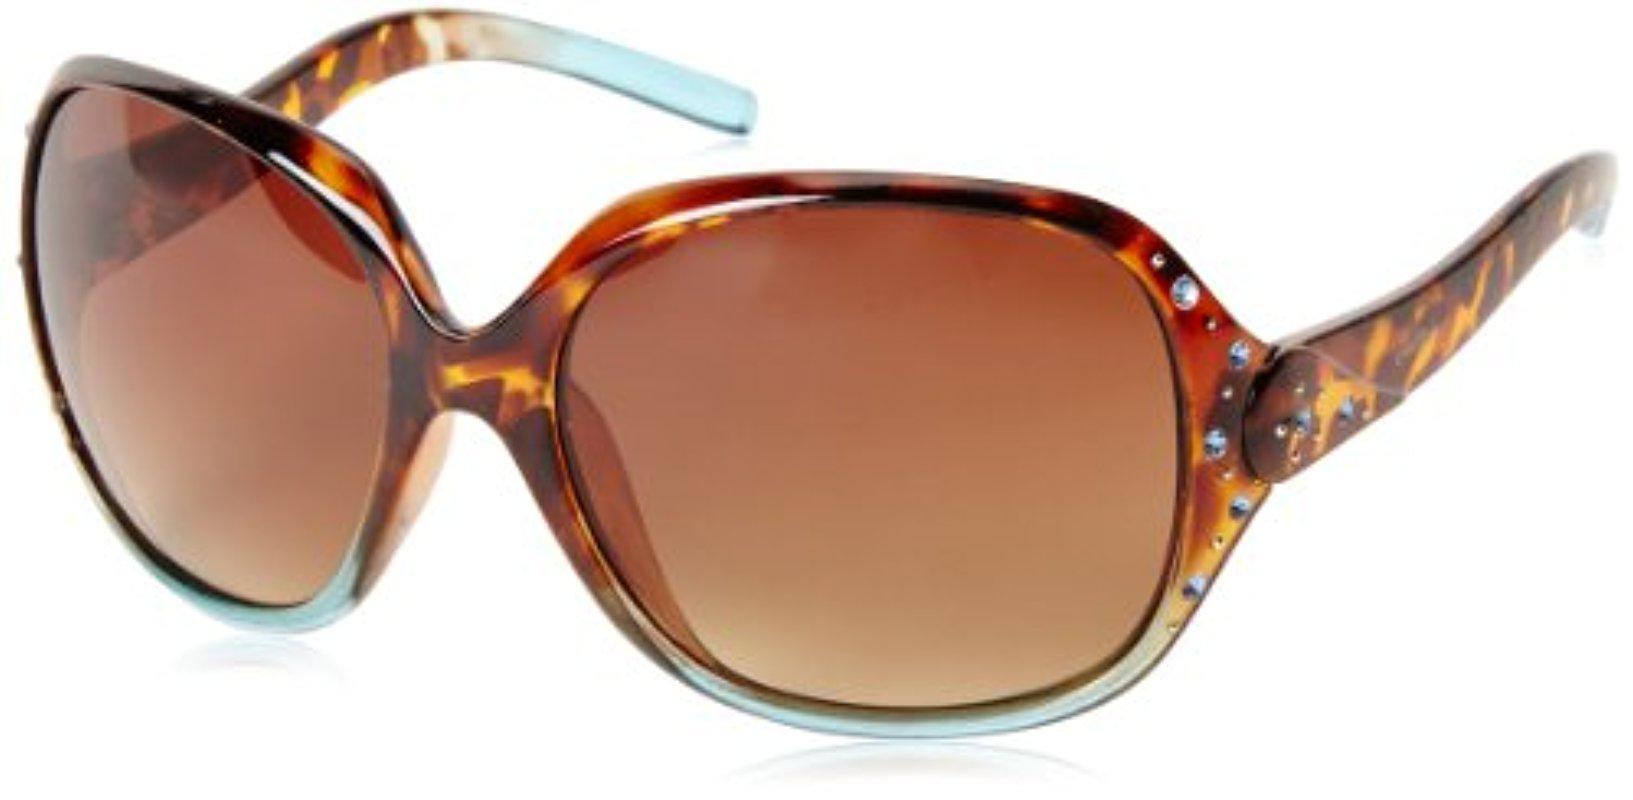 684d9b3bd3 Lyst - Sam Edelman Southpole 182sp Tstq Oval Sunglasses in Brown